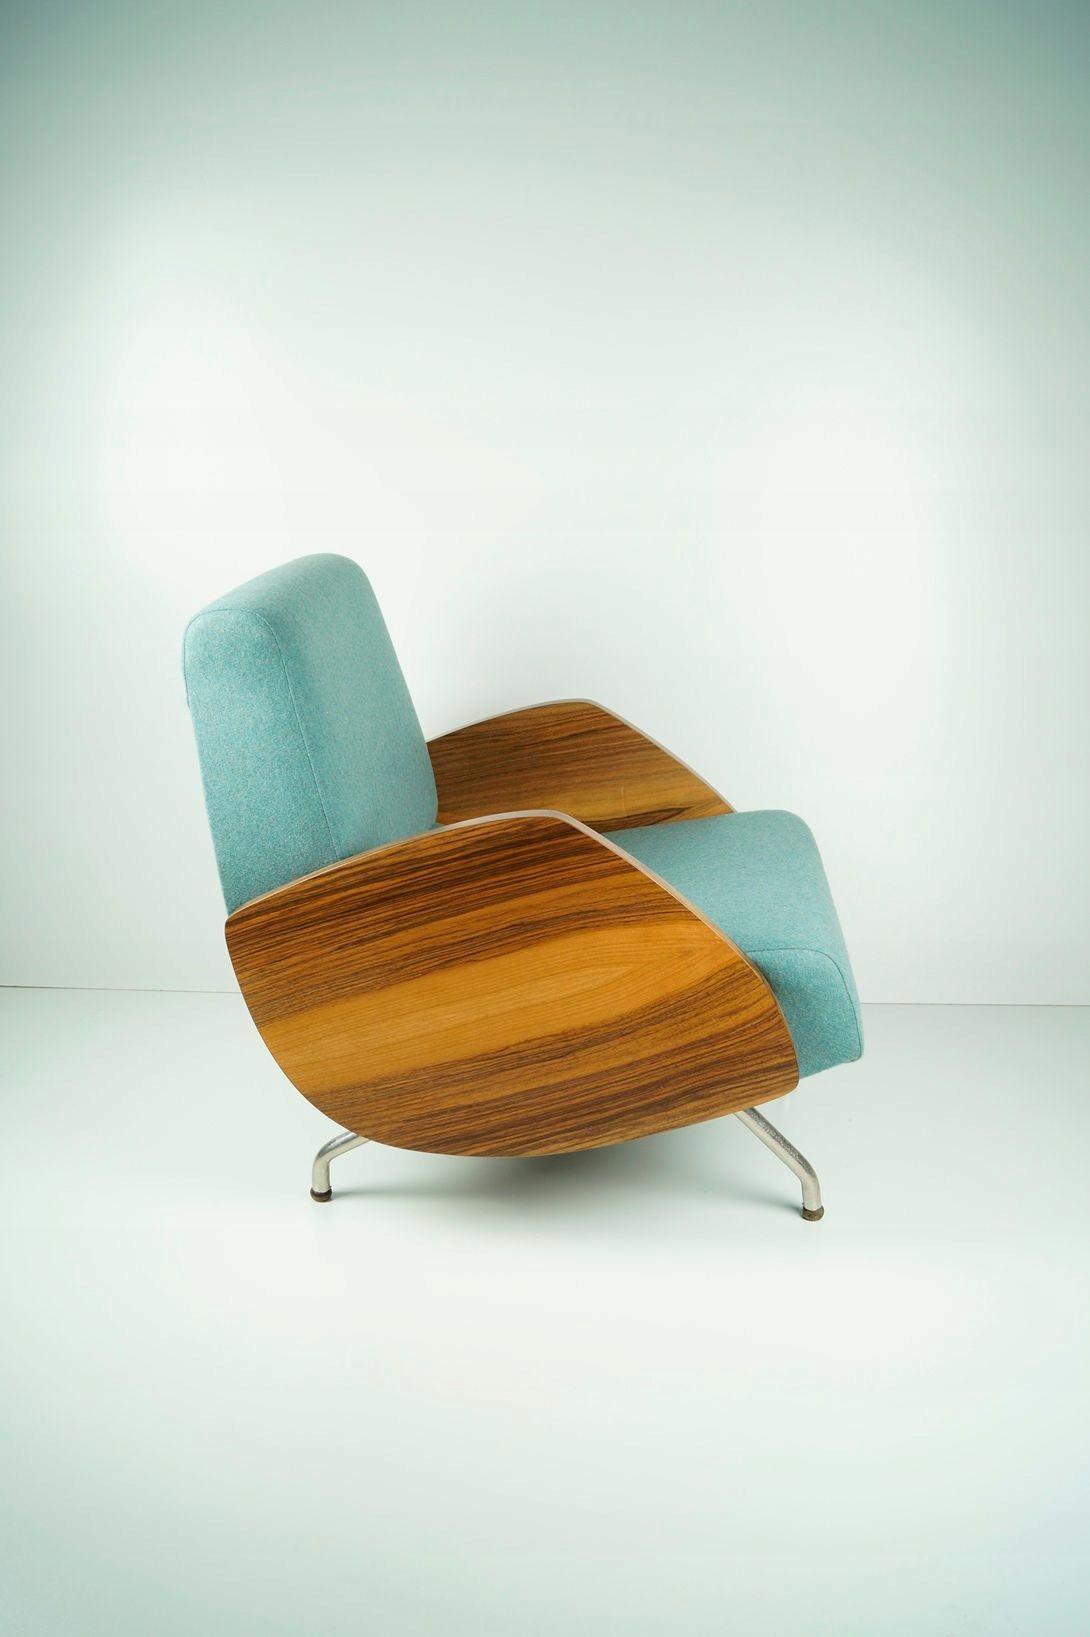 Fotel Typ 360 Vintage Design Lata 60 Prl Różański